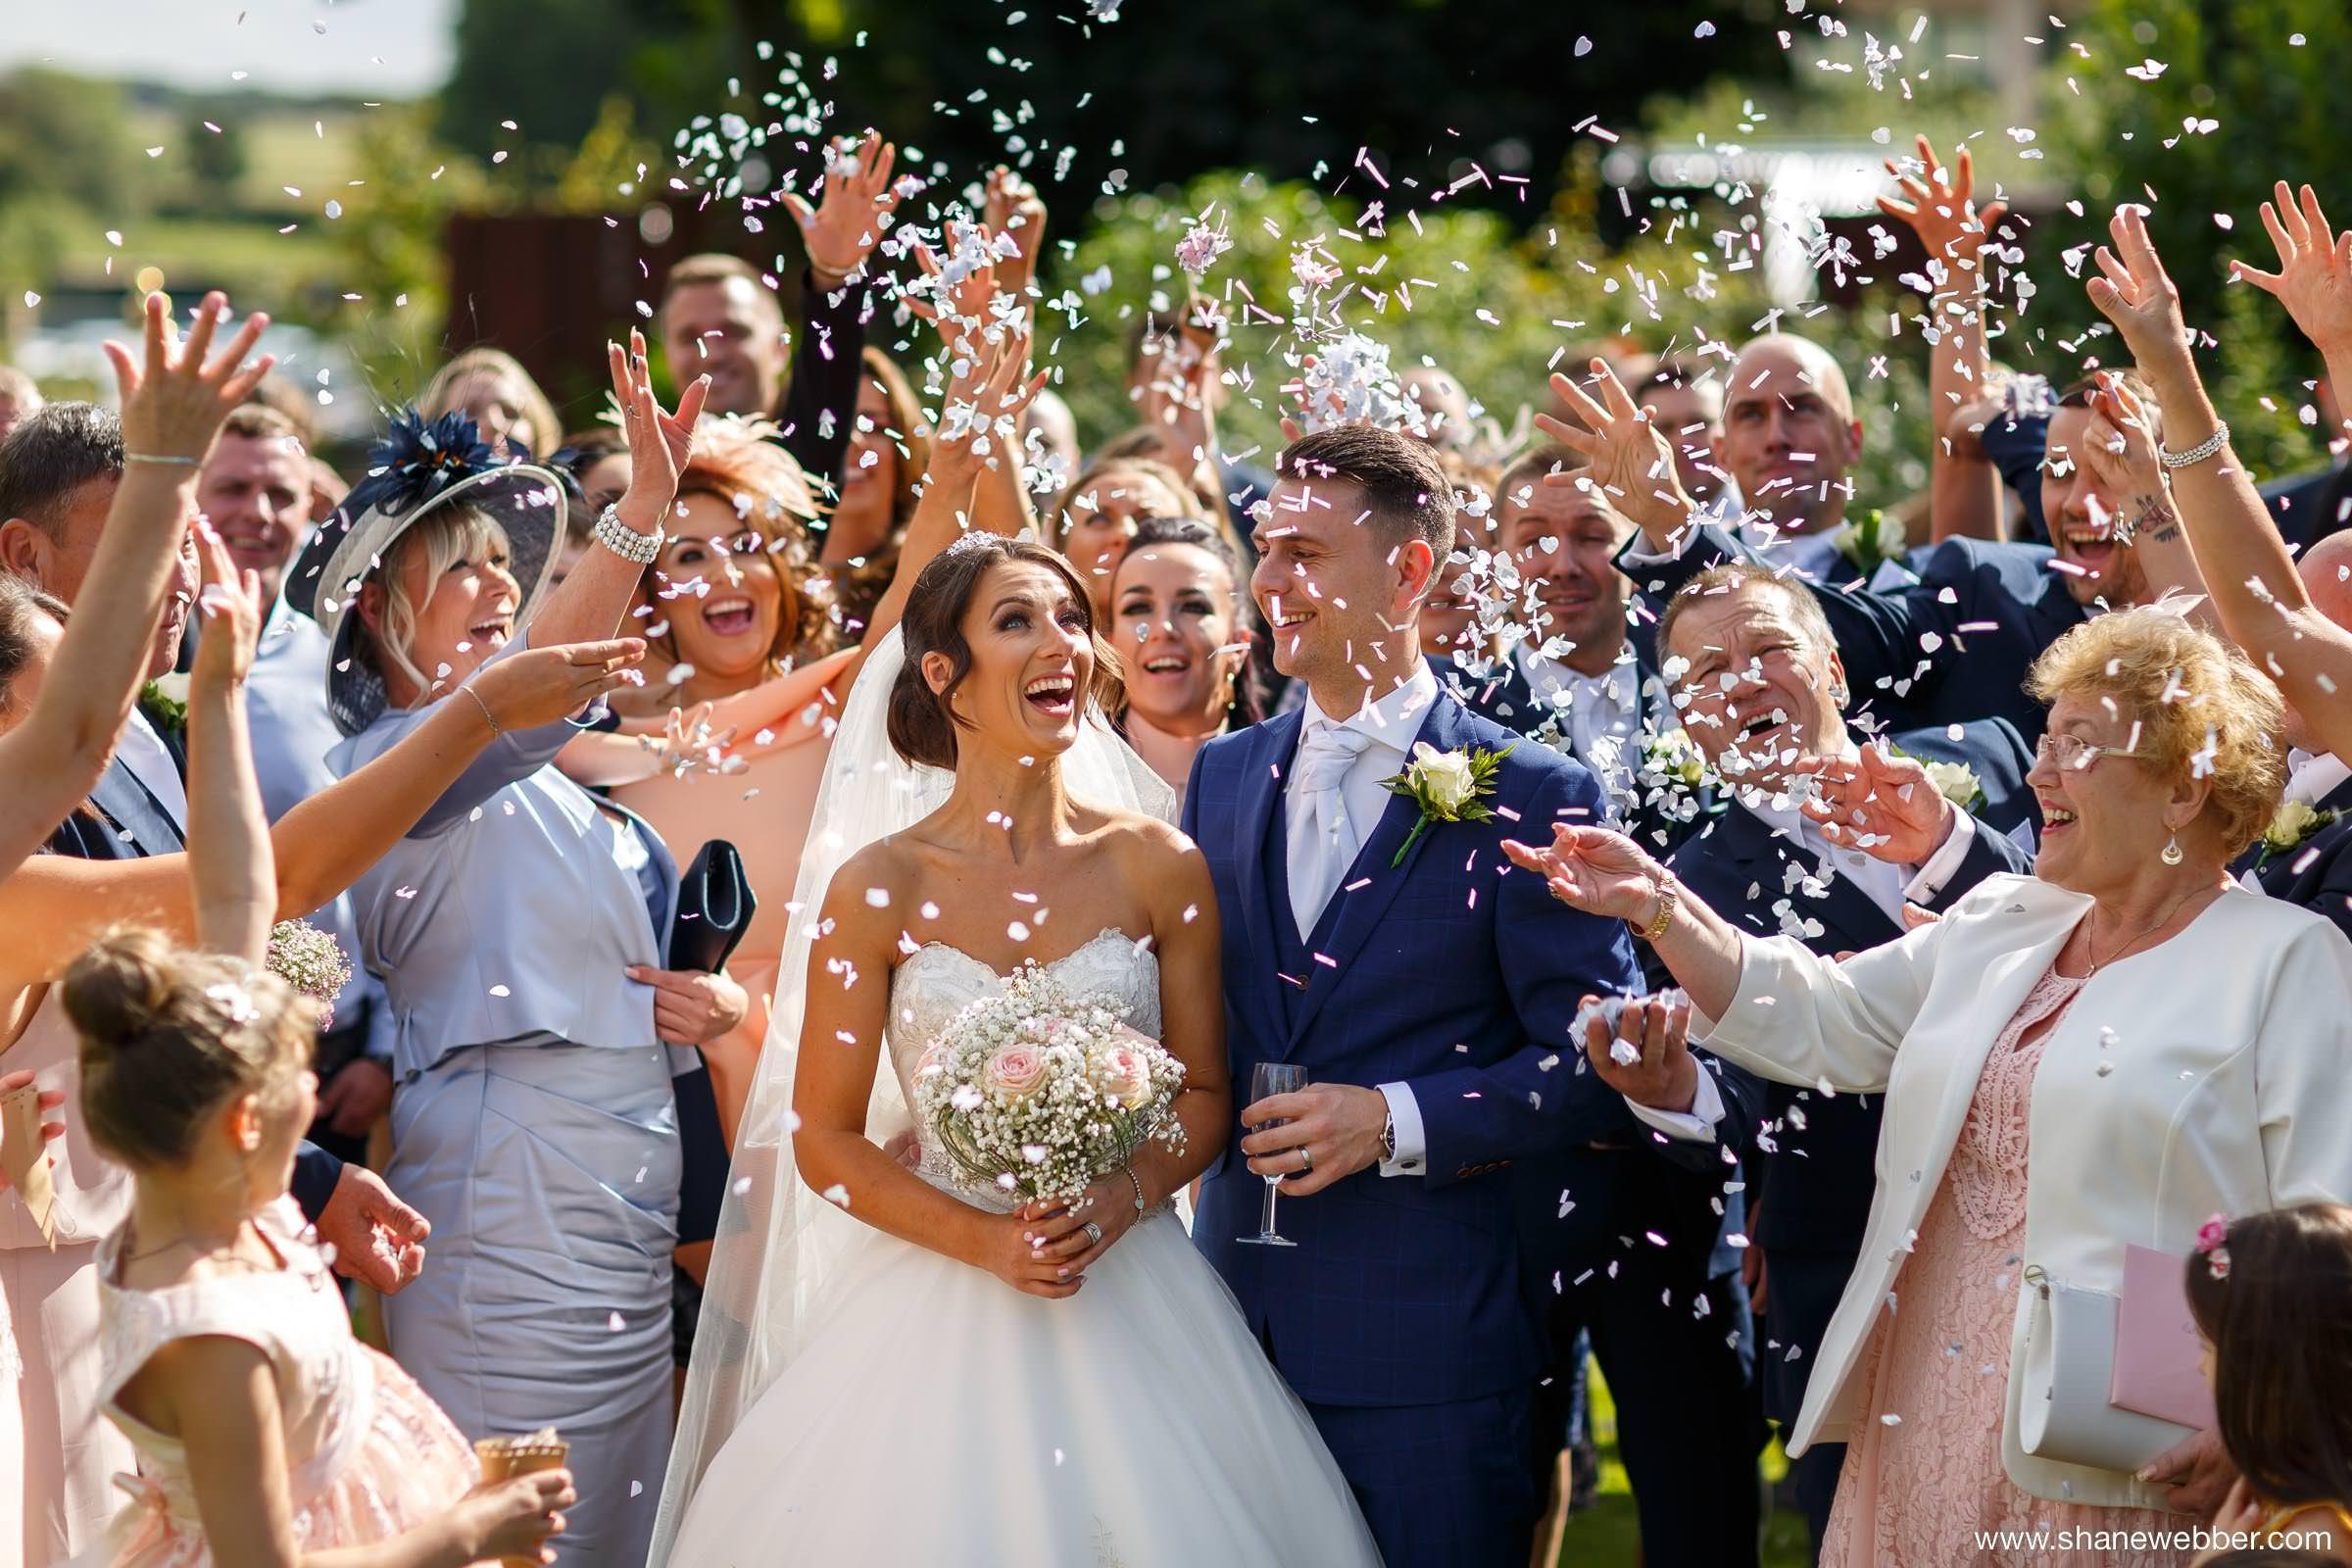 Best Confetti Wedding Photos Of 2016